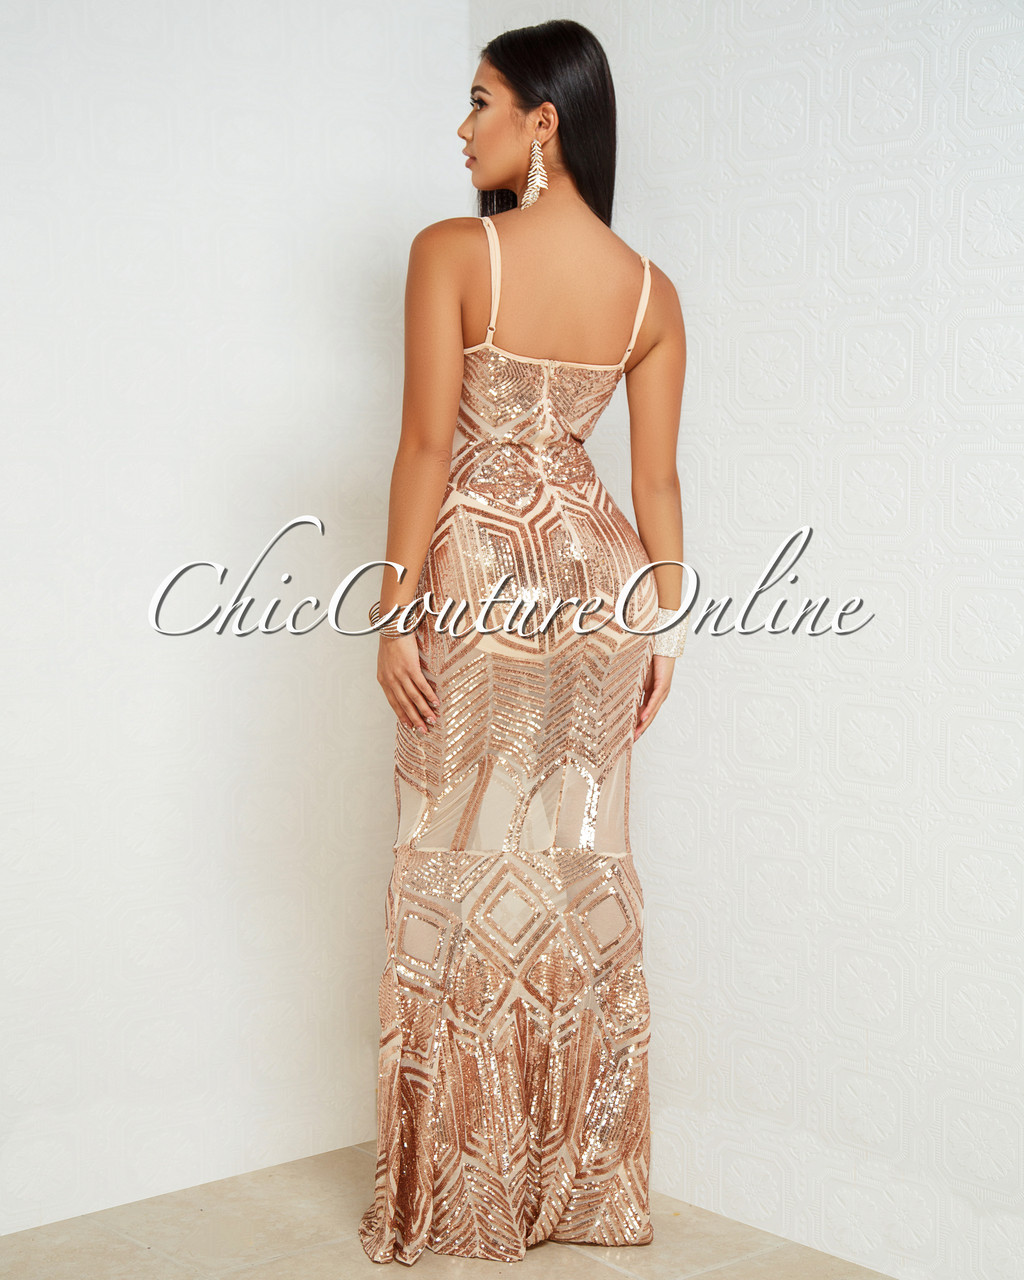 cbfe7464247 Catrina Nude Rose Gold Sequins Mesh Maxi Dress. Price   100.00. Image 1.  Larger   More Photos